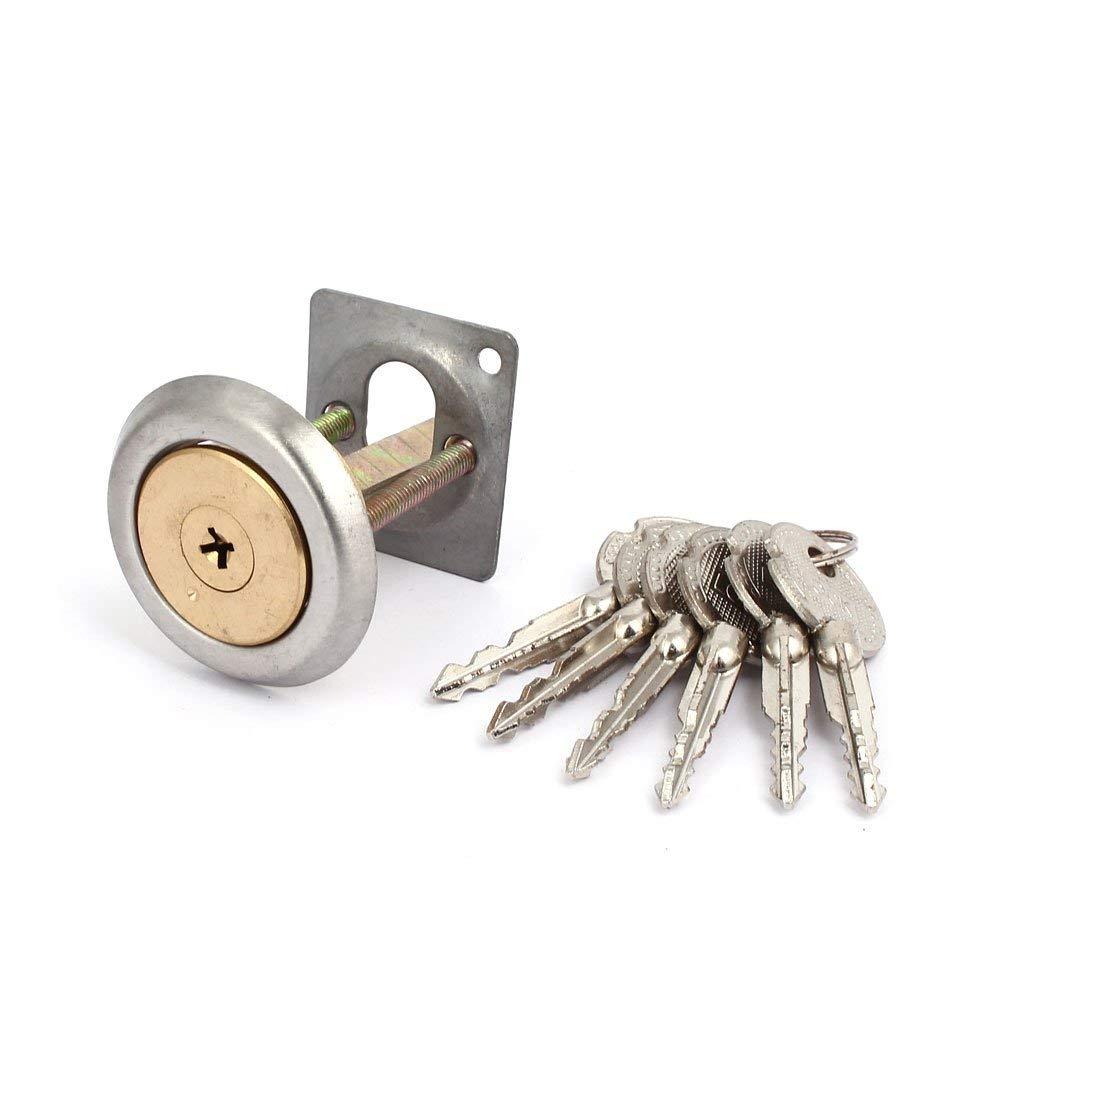 uxcell Home Office Door Metal Anti-Theft Security Entrance Deadbolt Cylinder Lock w Keys